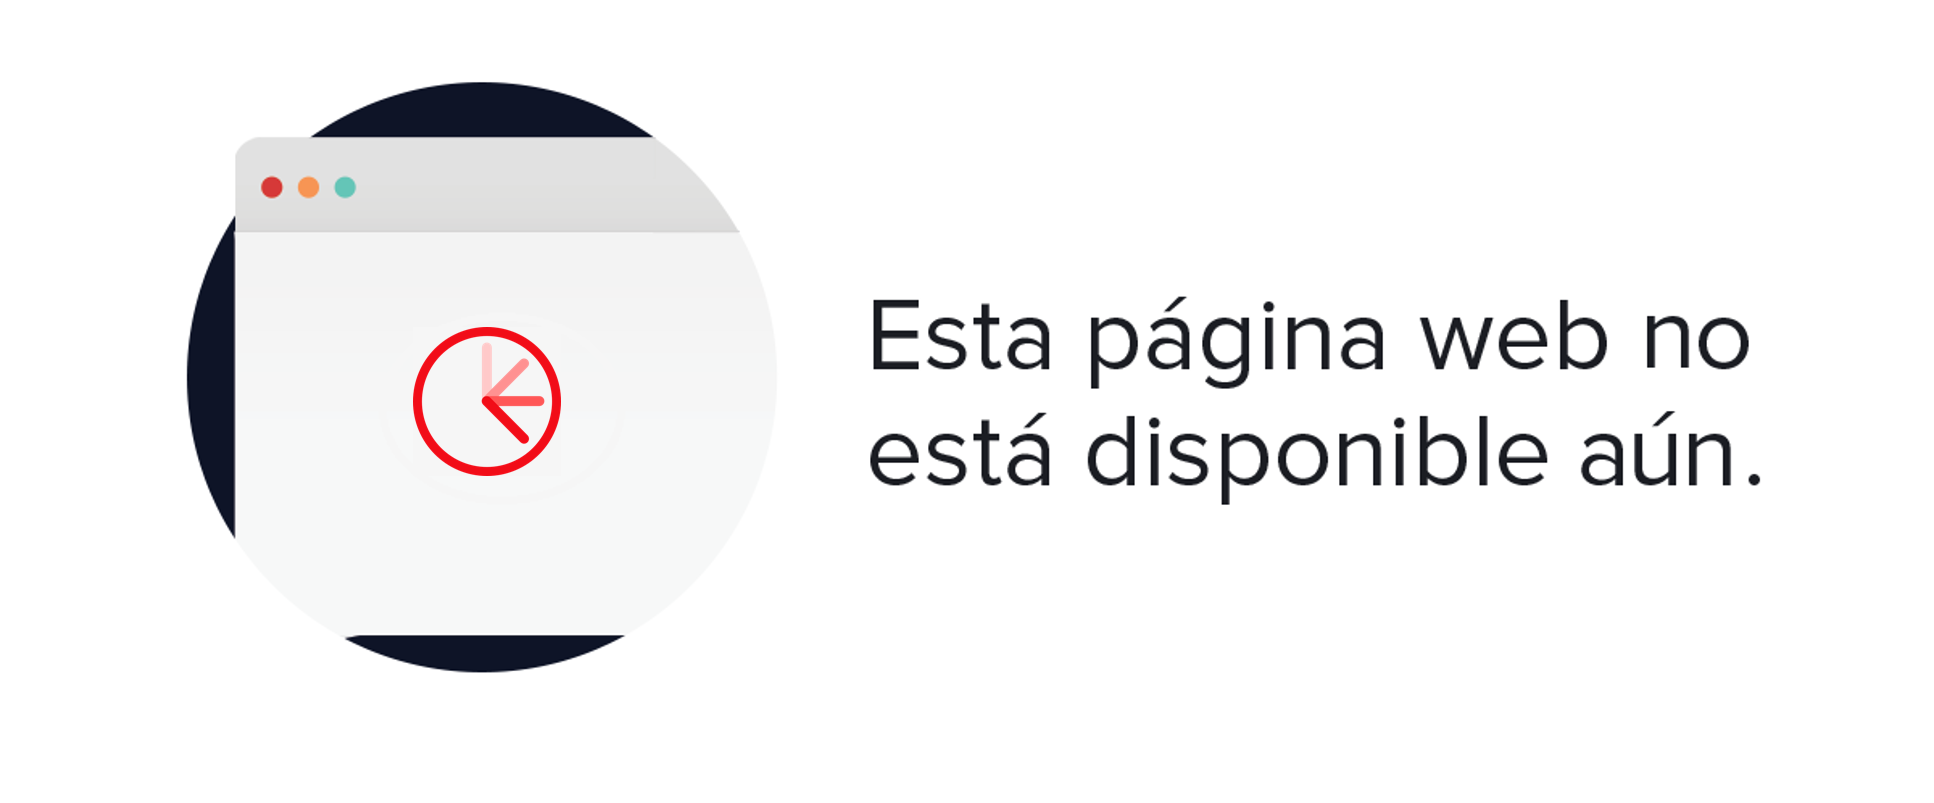 Hogan Marina Zapatillas Deportivas Hombre 469565 - Barato - DNYONQG